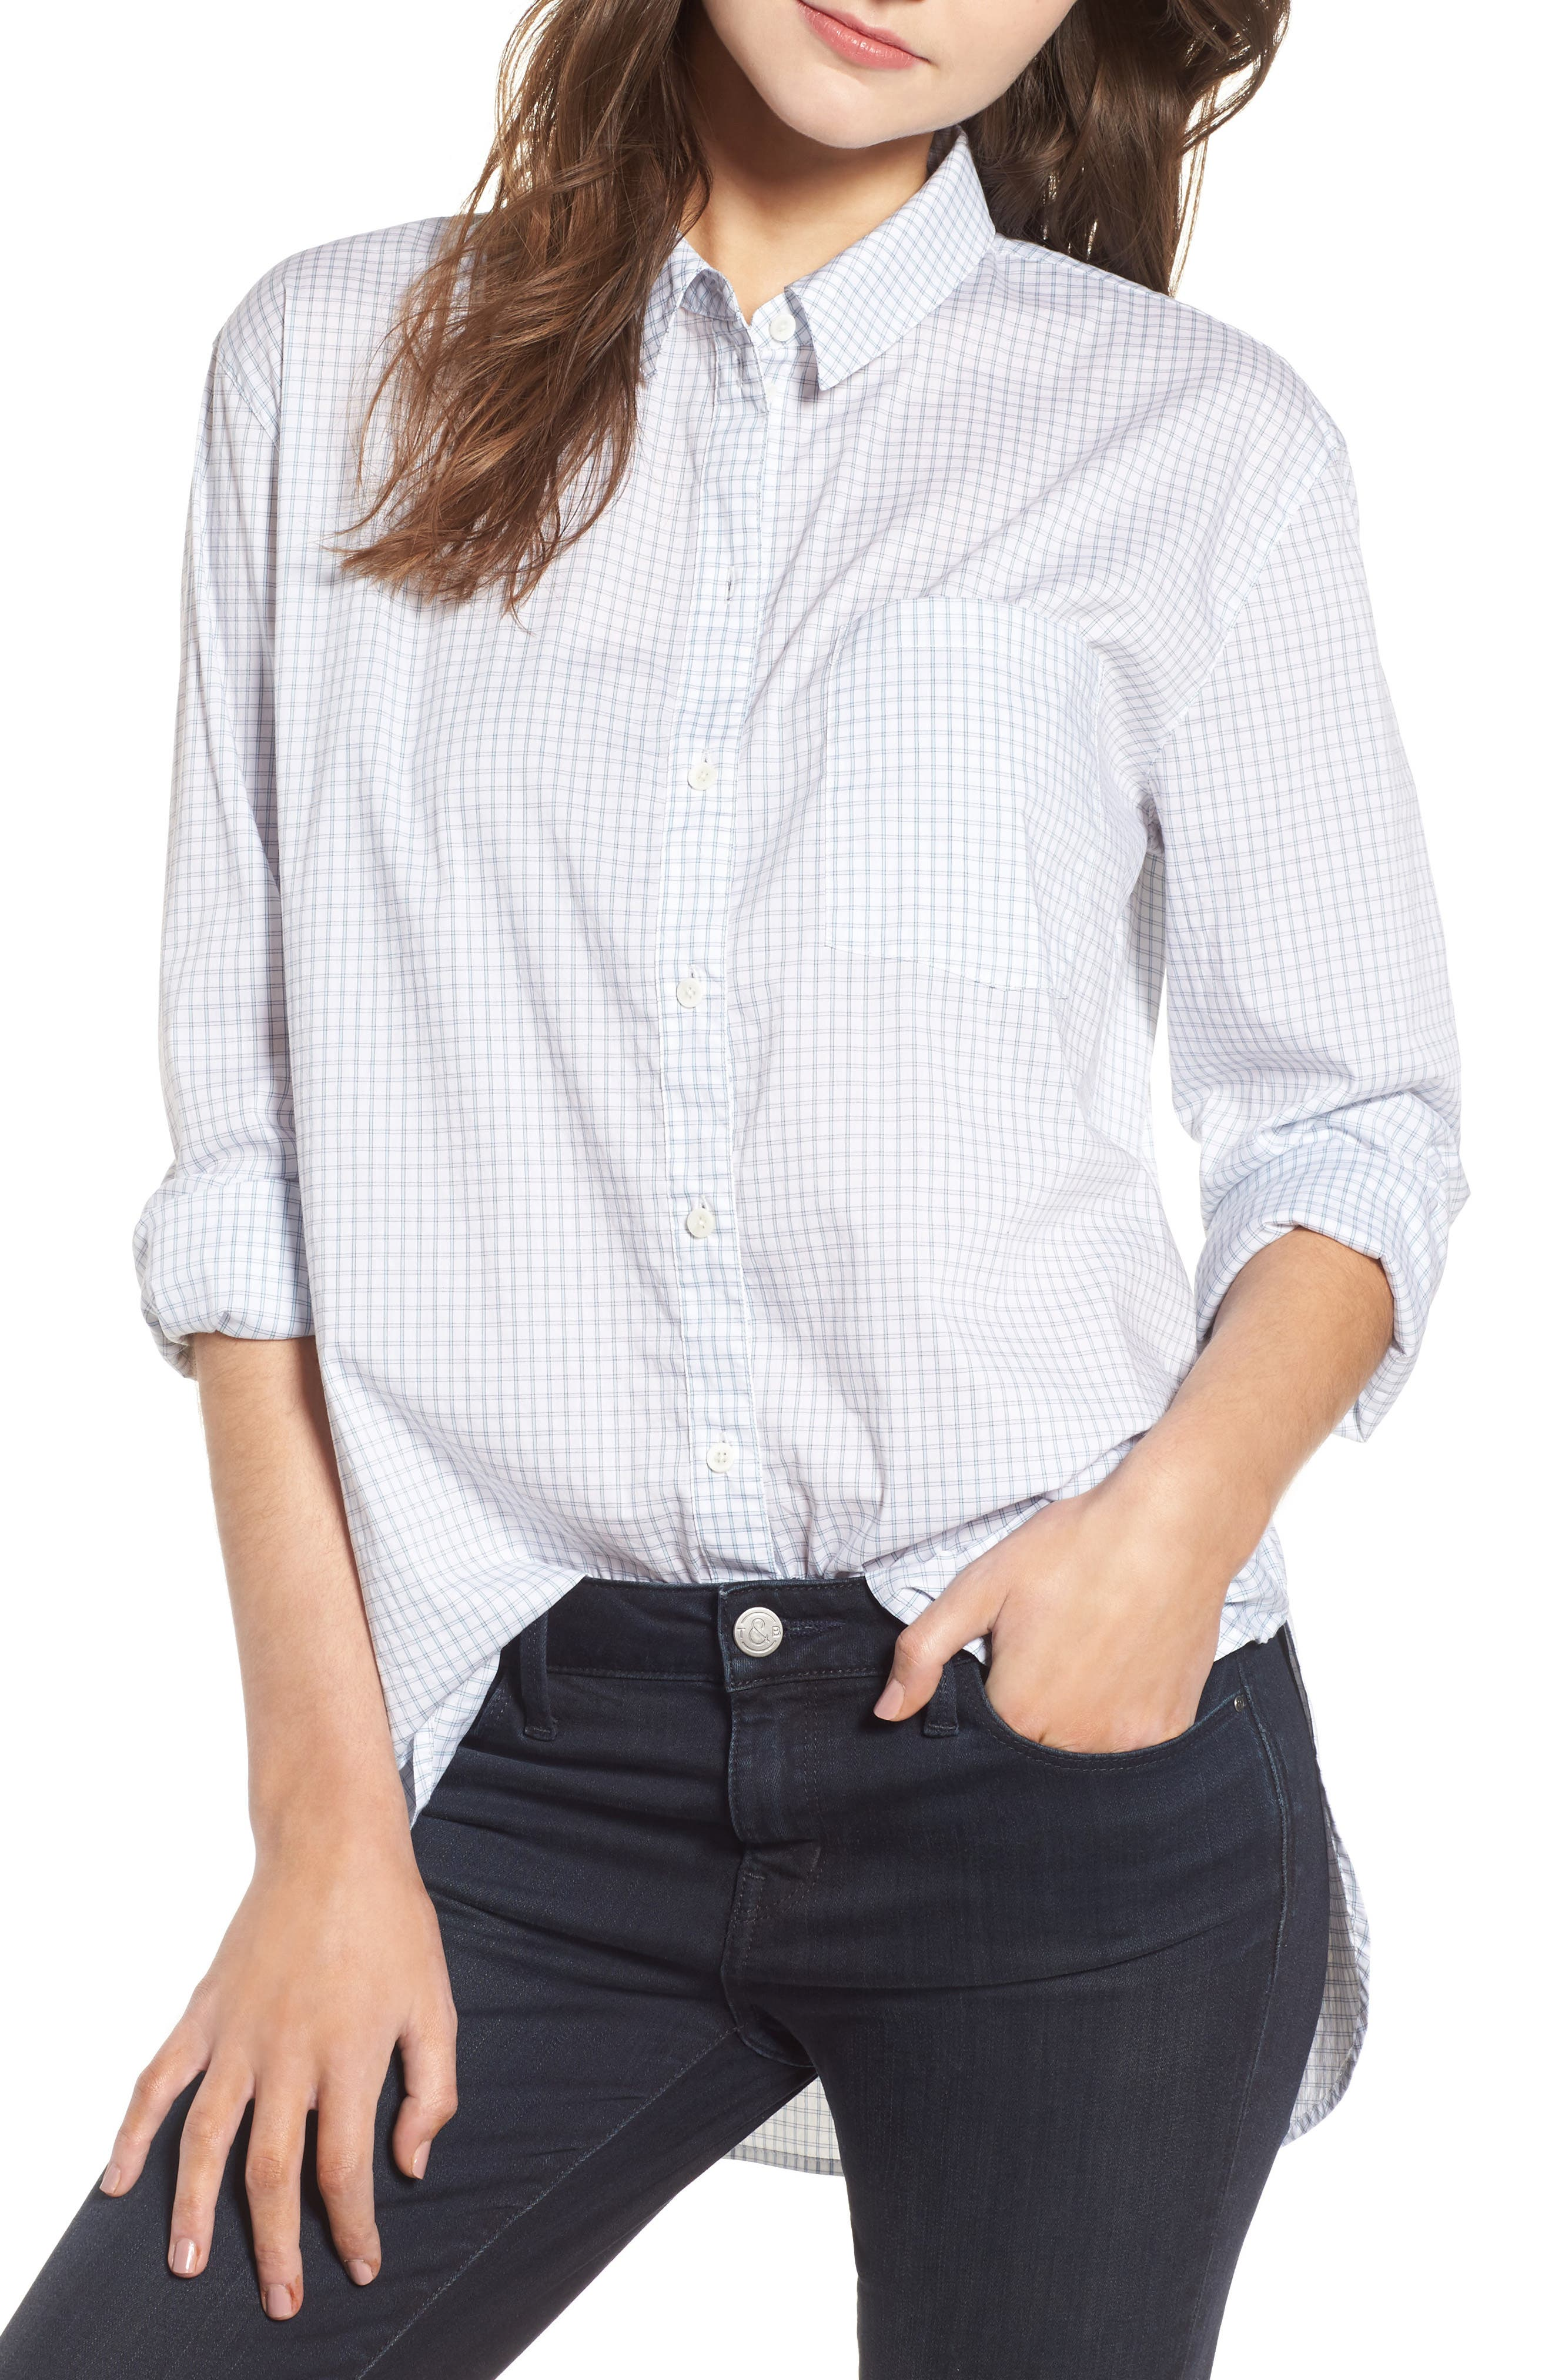 Oversize Check Shirt,                         Main,                         color, White Blue Poplin Check